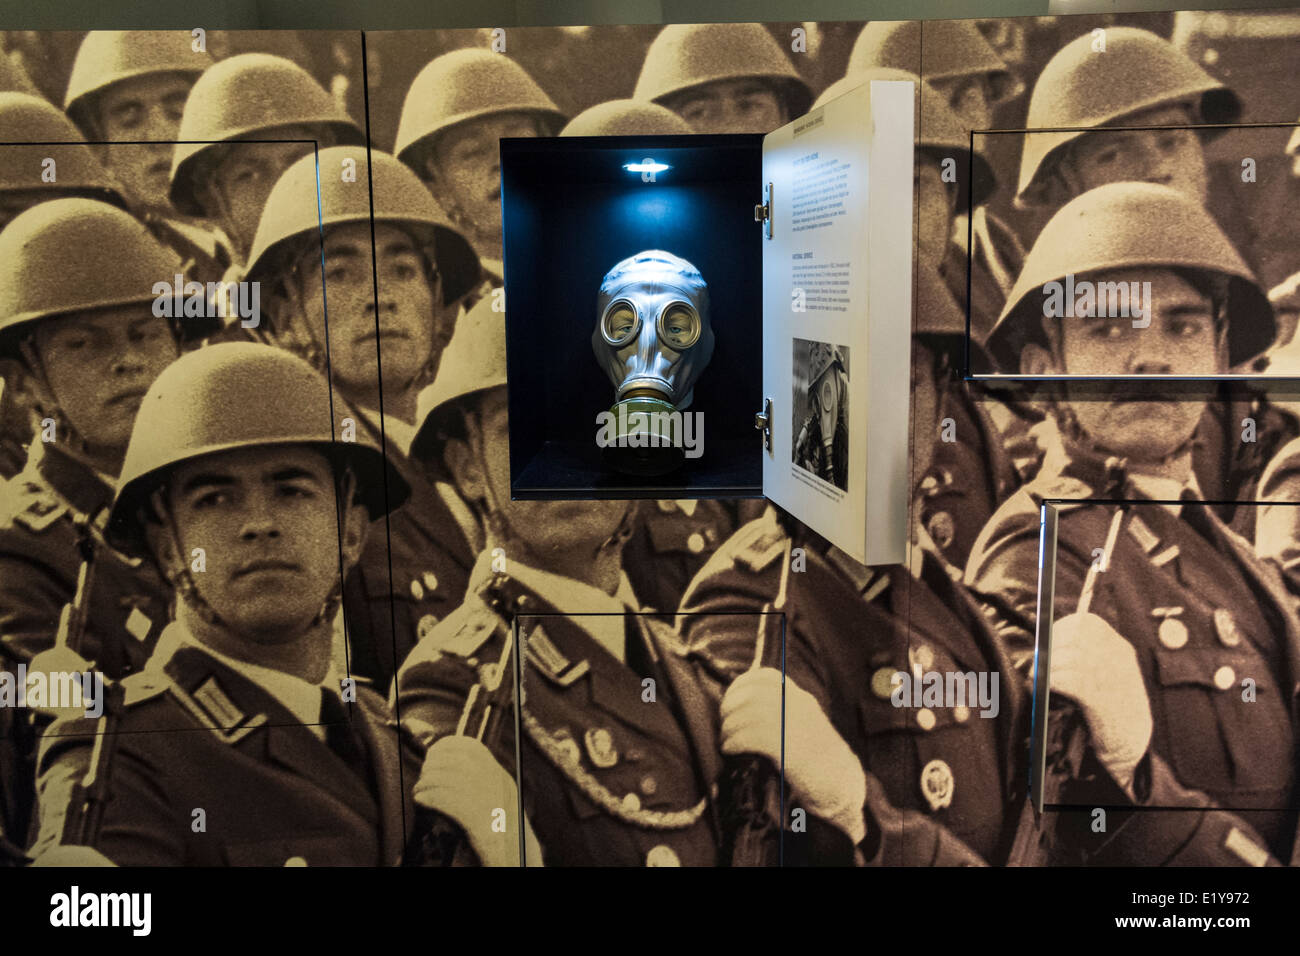 Exhibit inside DDR Museum ( East German Museum ) in Berlin Germany - Stock Image